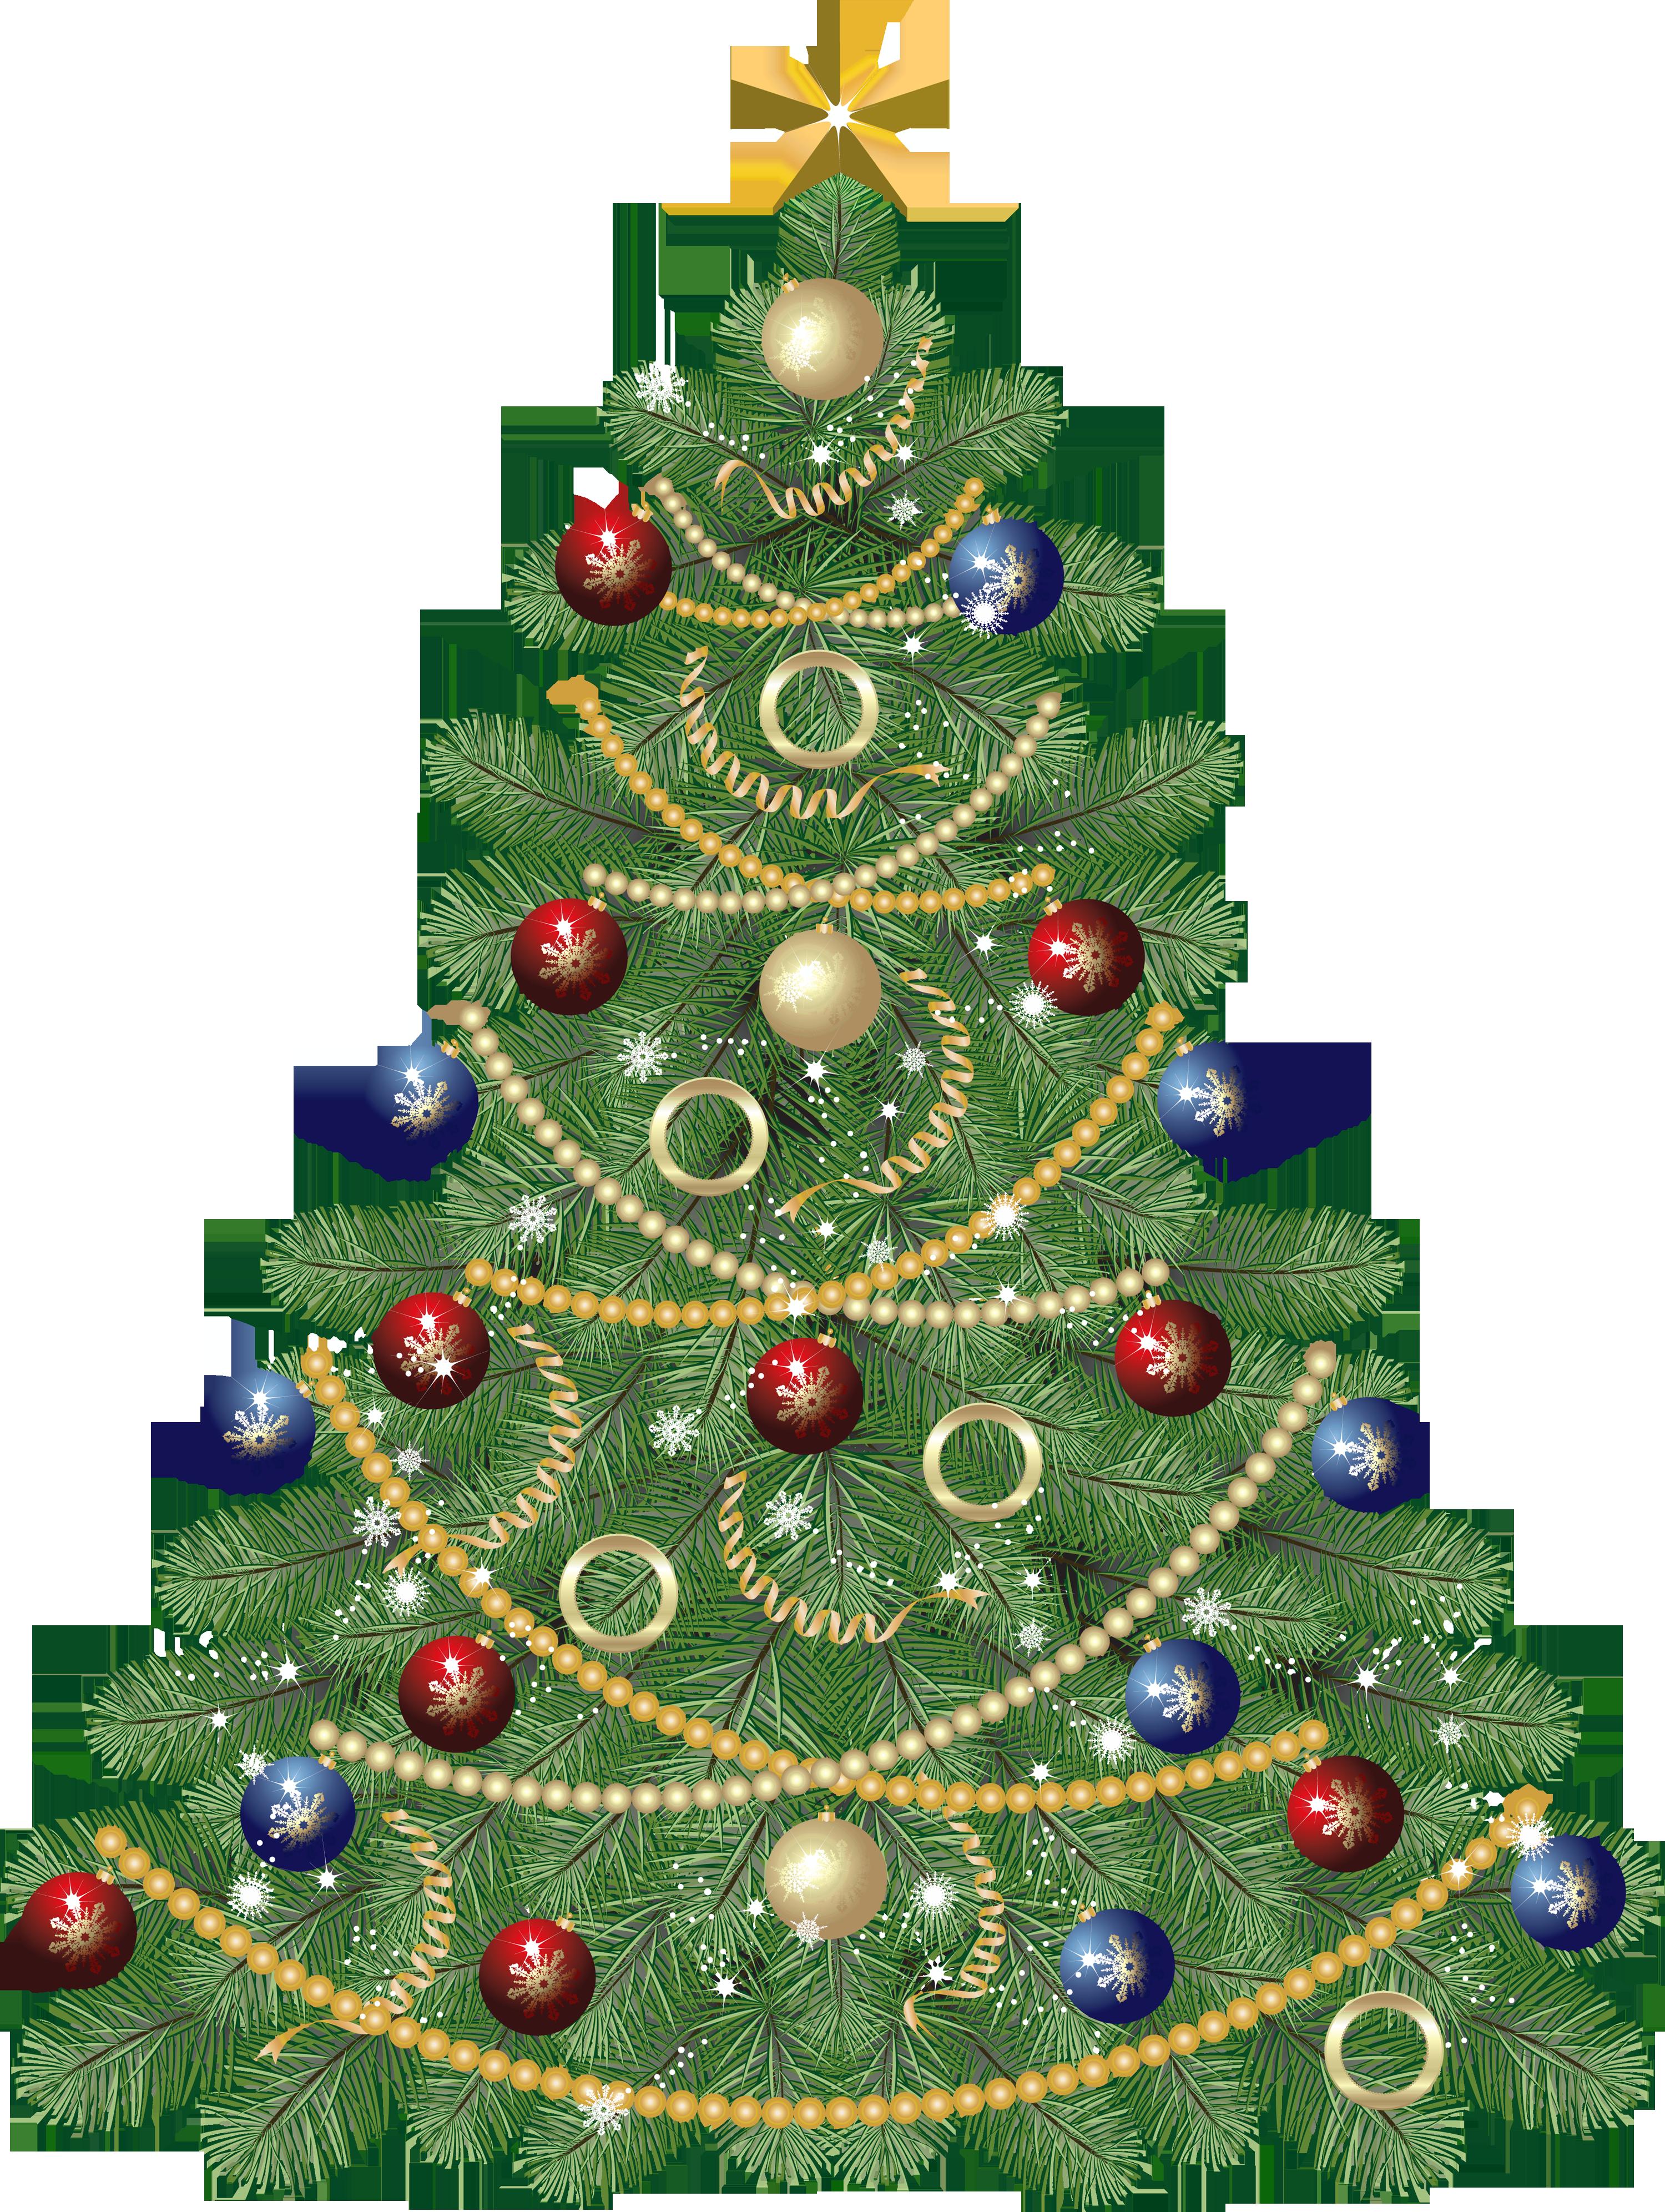 Free christmas tree clipart public domai-Free christmas tree clipart public domain christmas clip art 4-15